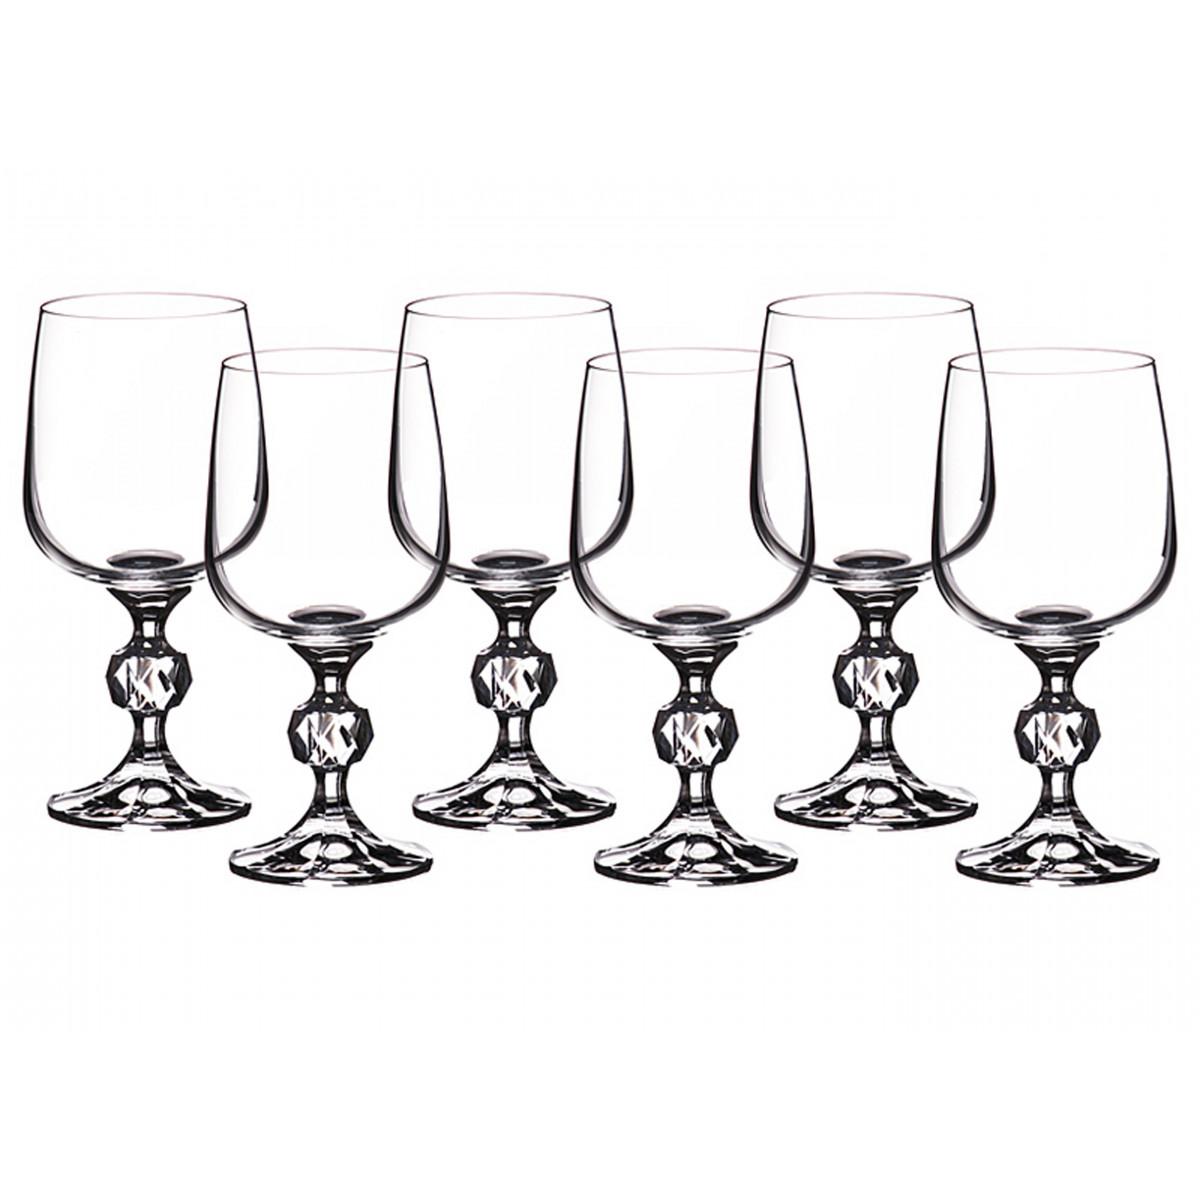 {} Crystalite Bohemia Набор бокалов для вина Keavy (15 см - 6 шт) набор бокалов для бренди 6 шт crystalite bohemia набор бокалов для бренди 6 шт